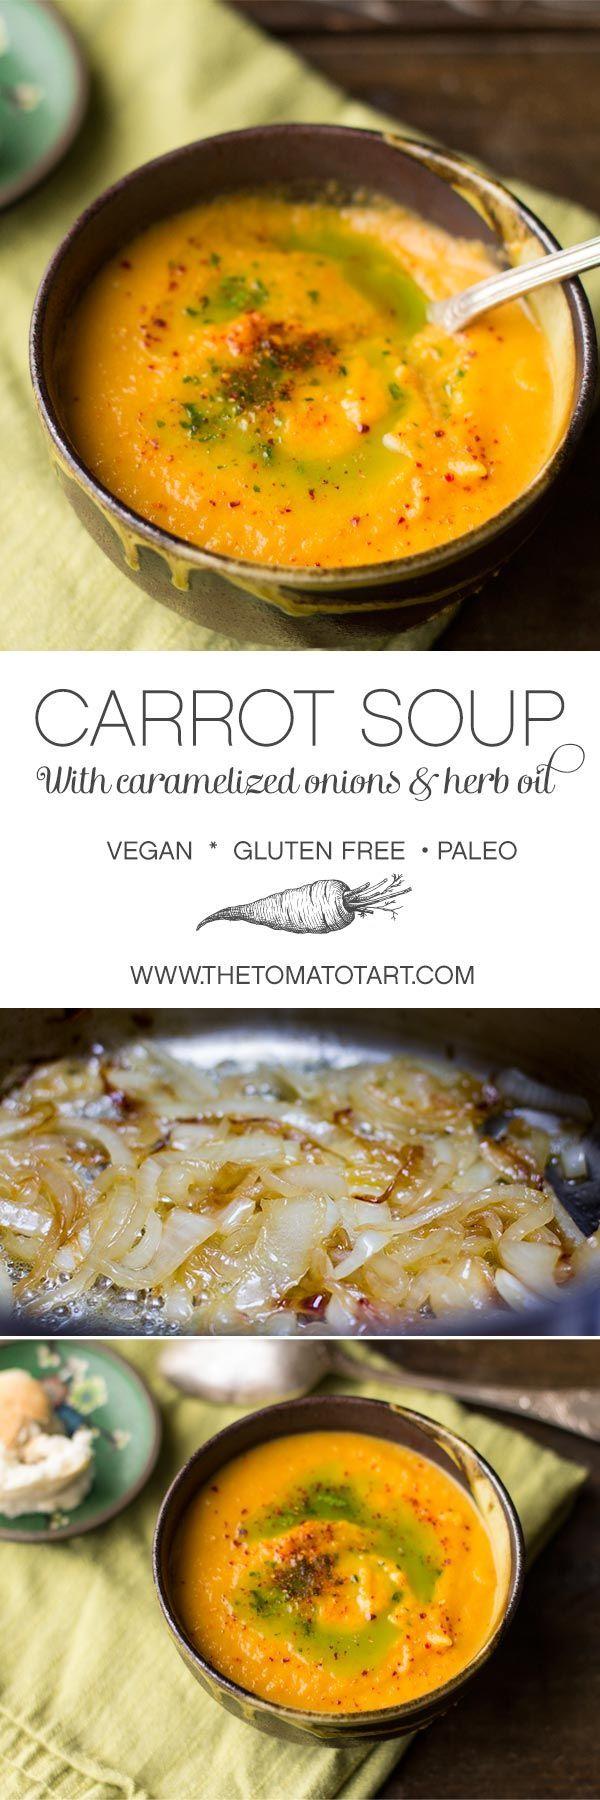 Caramelized Onion & Carrot Soup Recipe #vegan #glutenfree #paleo